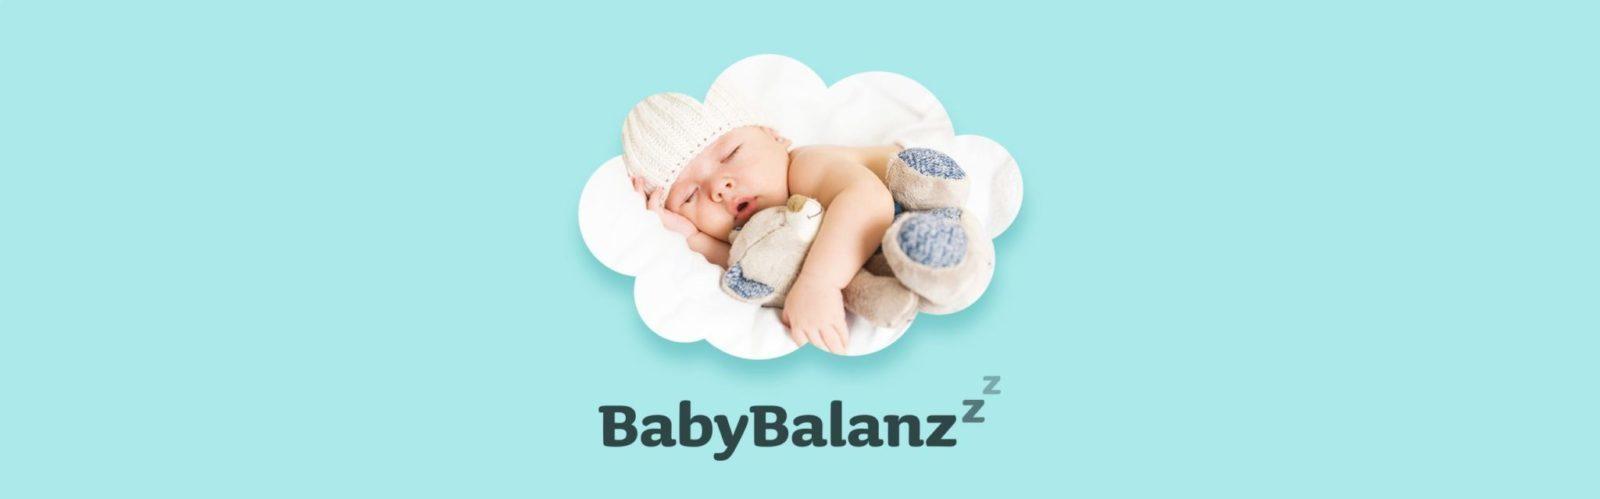 Branding BabyBalanz